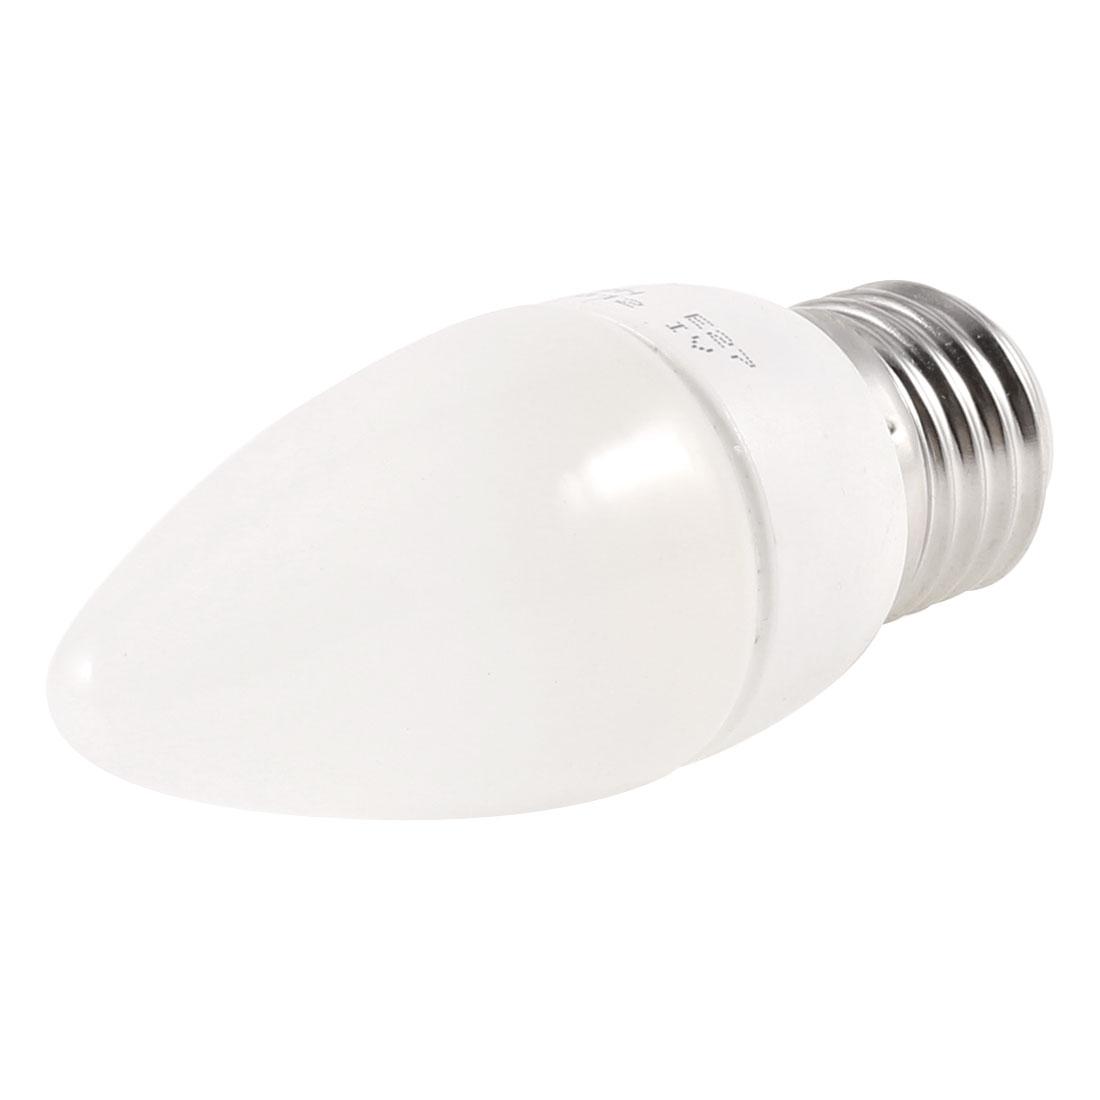 Bathroom E27 Screw Base 3000K Yellow LED Light Candle Bulb 2W AC 220V